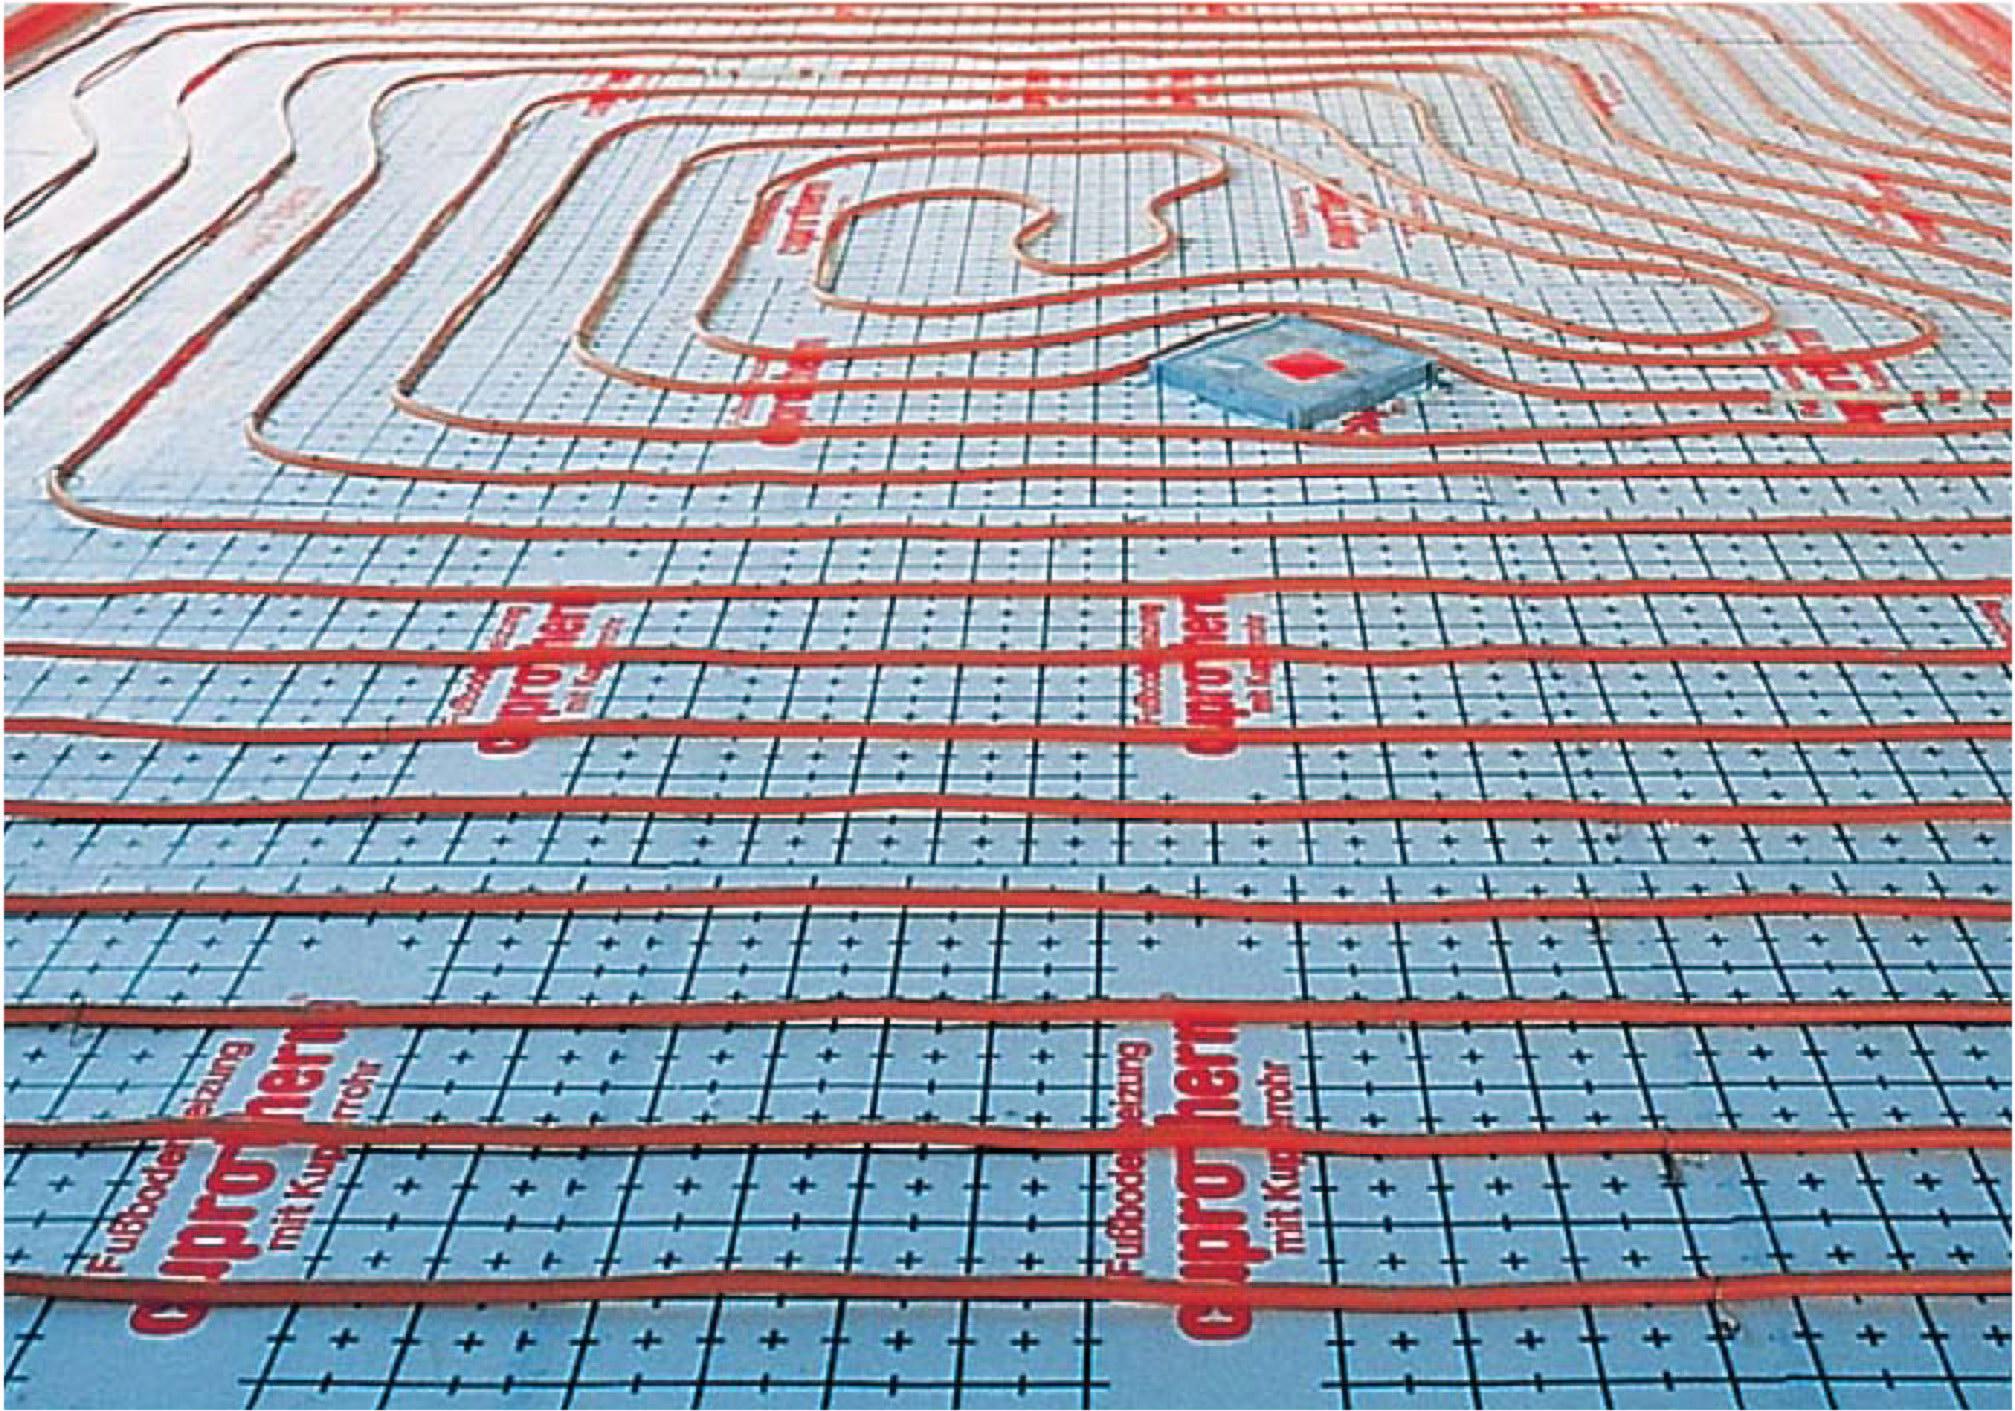 Verlegen Fußbodenheizung spiralförmige verlegung fußbodenheizung shkwissen